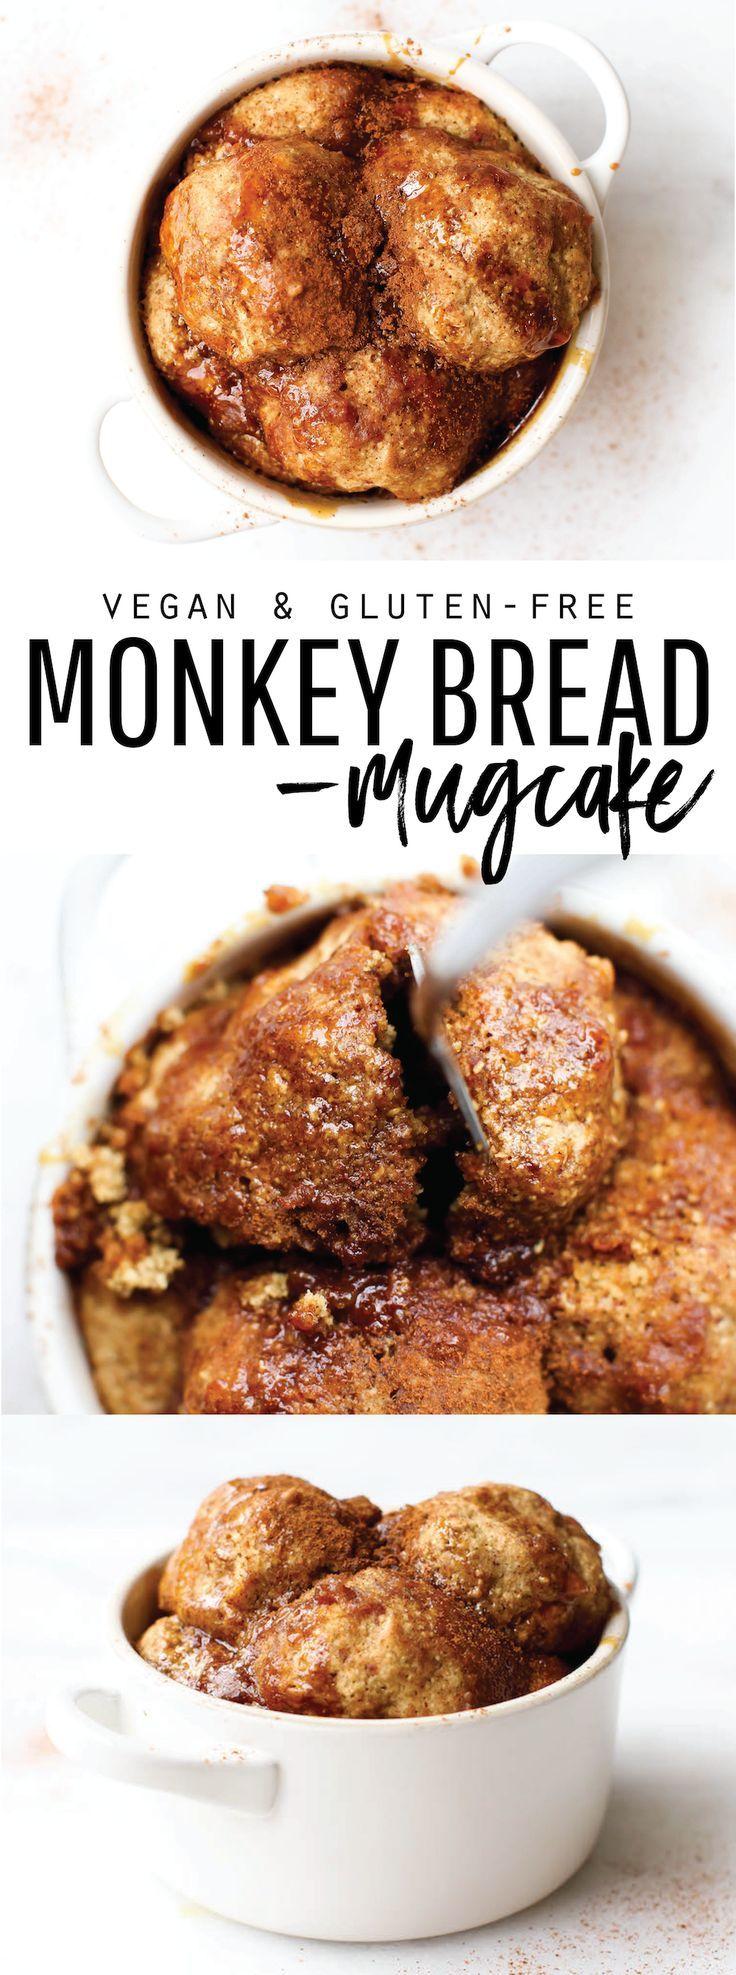 Vegan Monkey Bread Mug Cake gluten-free & oil-free